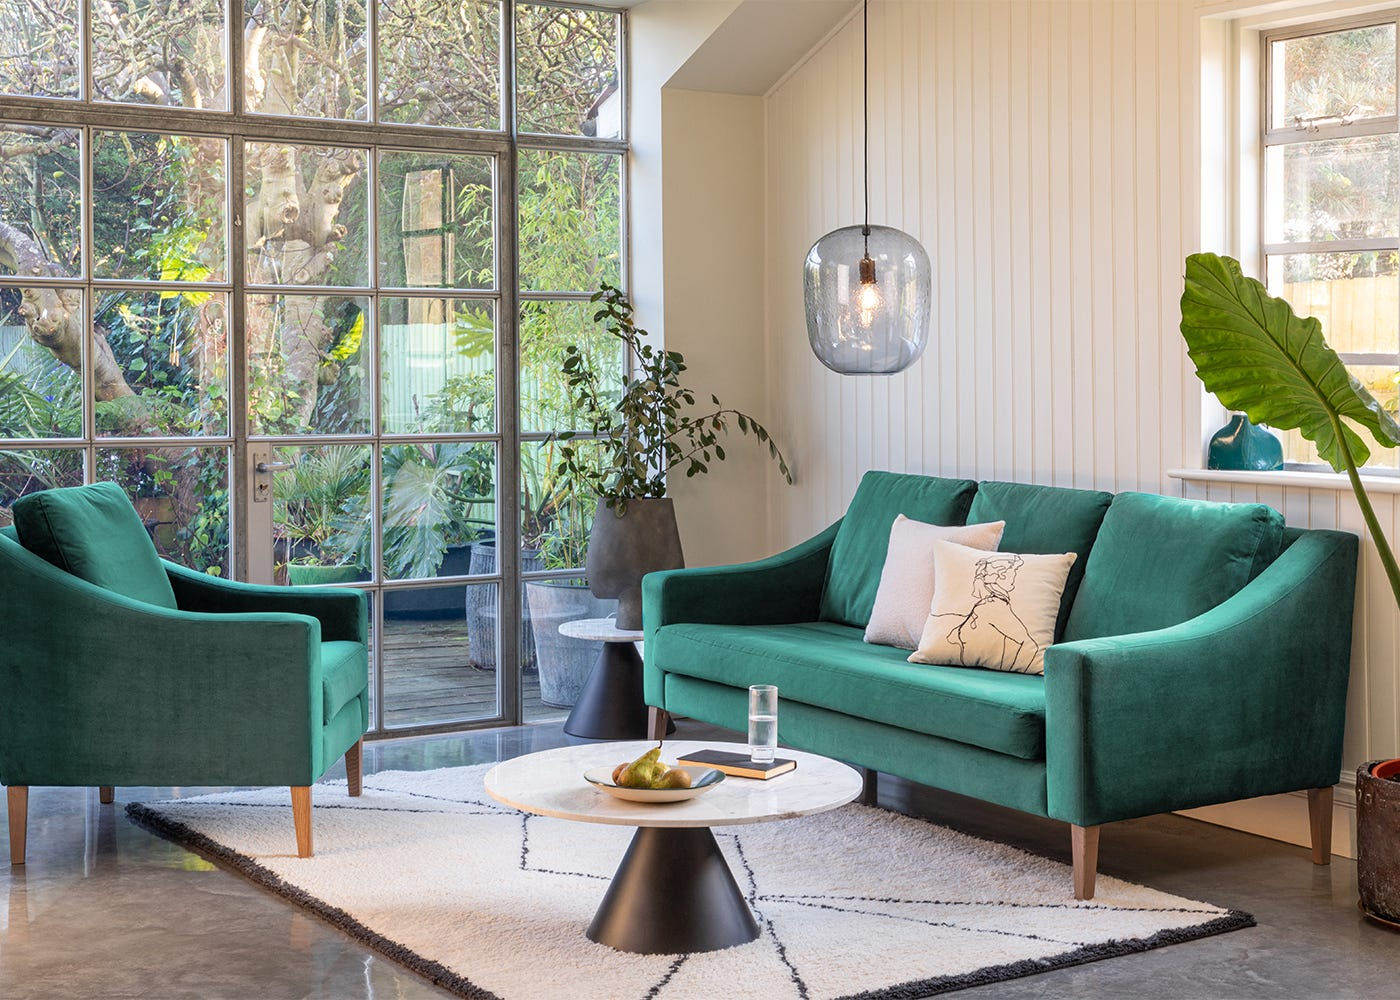 3 Seater Sofa and Armchair in Smart Velvet Sea Foam